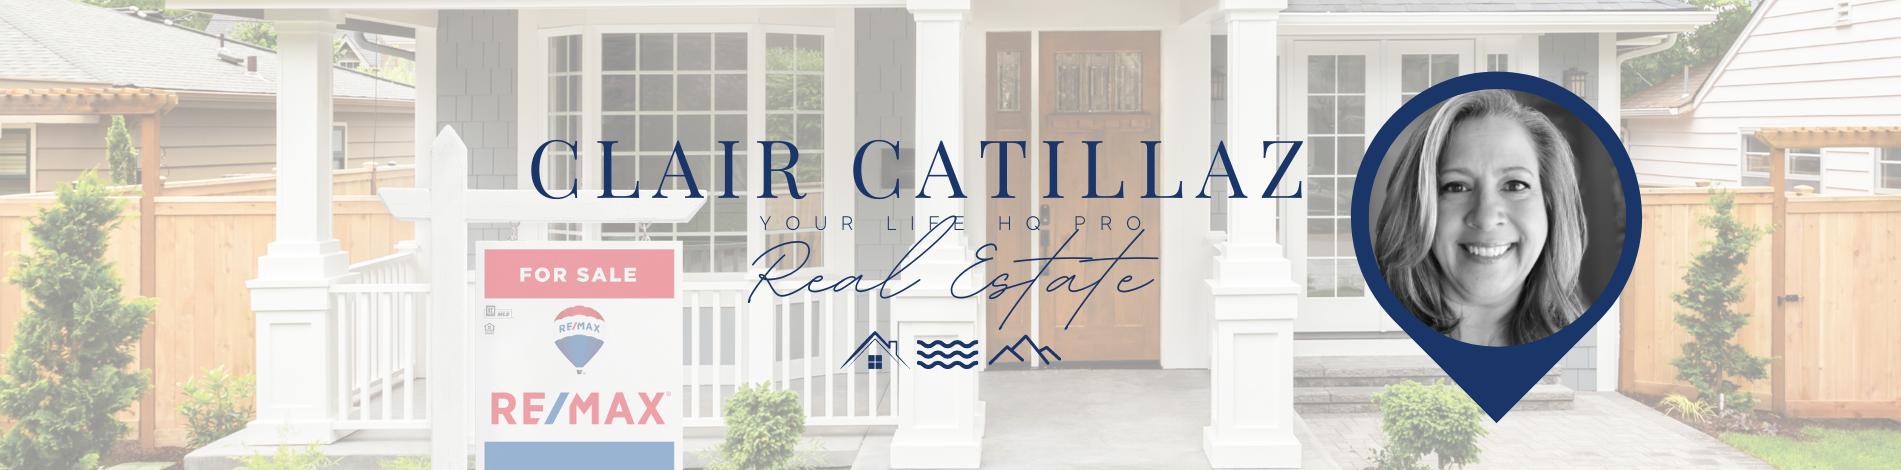 Clair Catillaz Real Estate Main Page